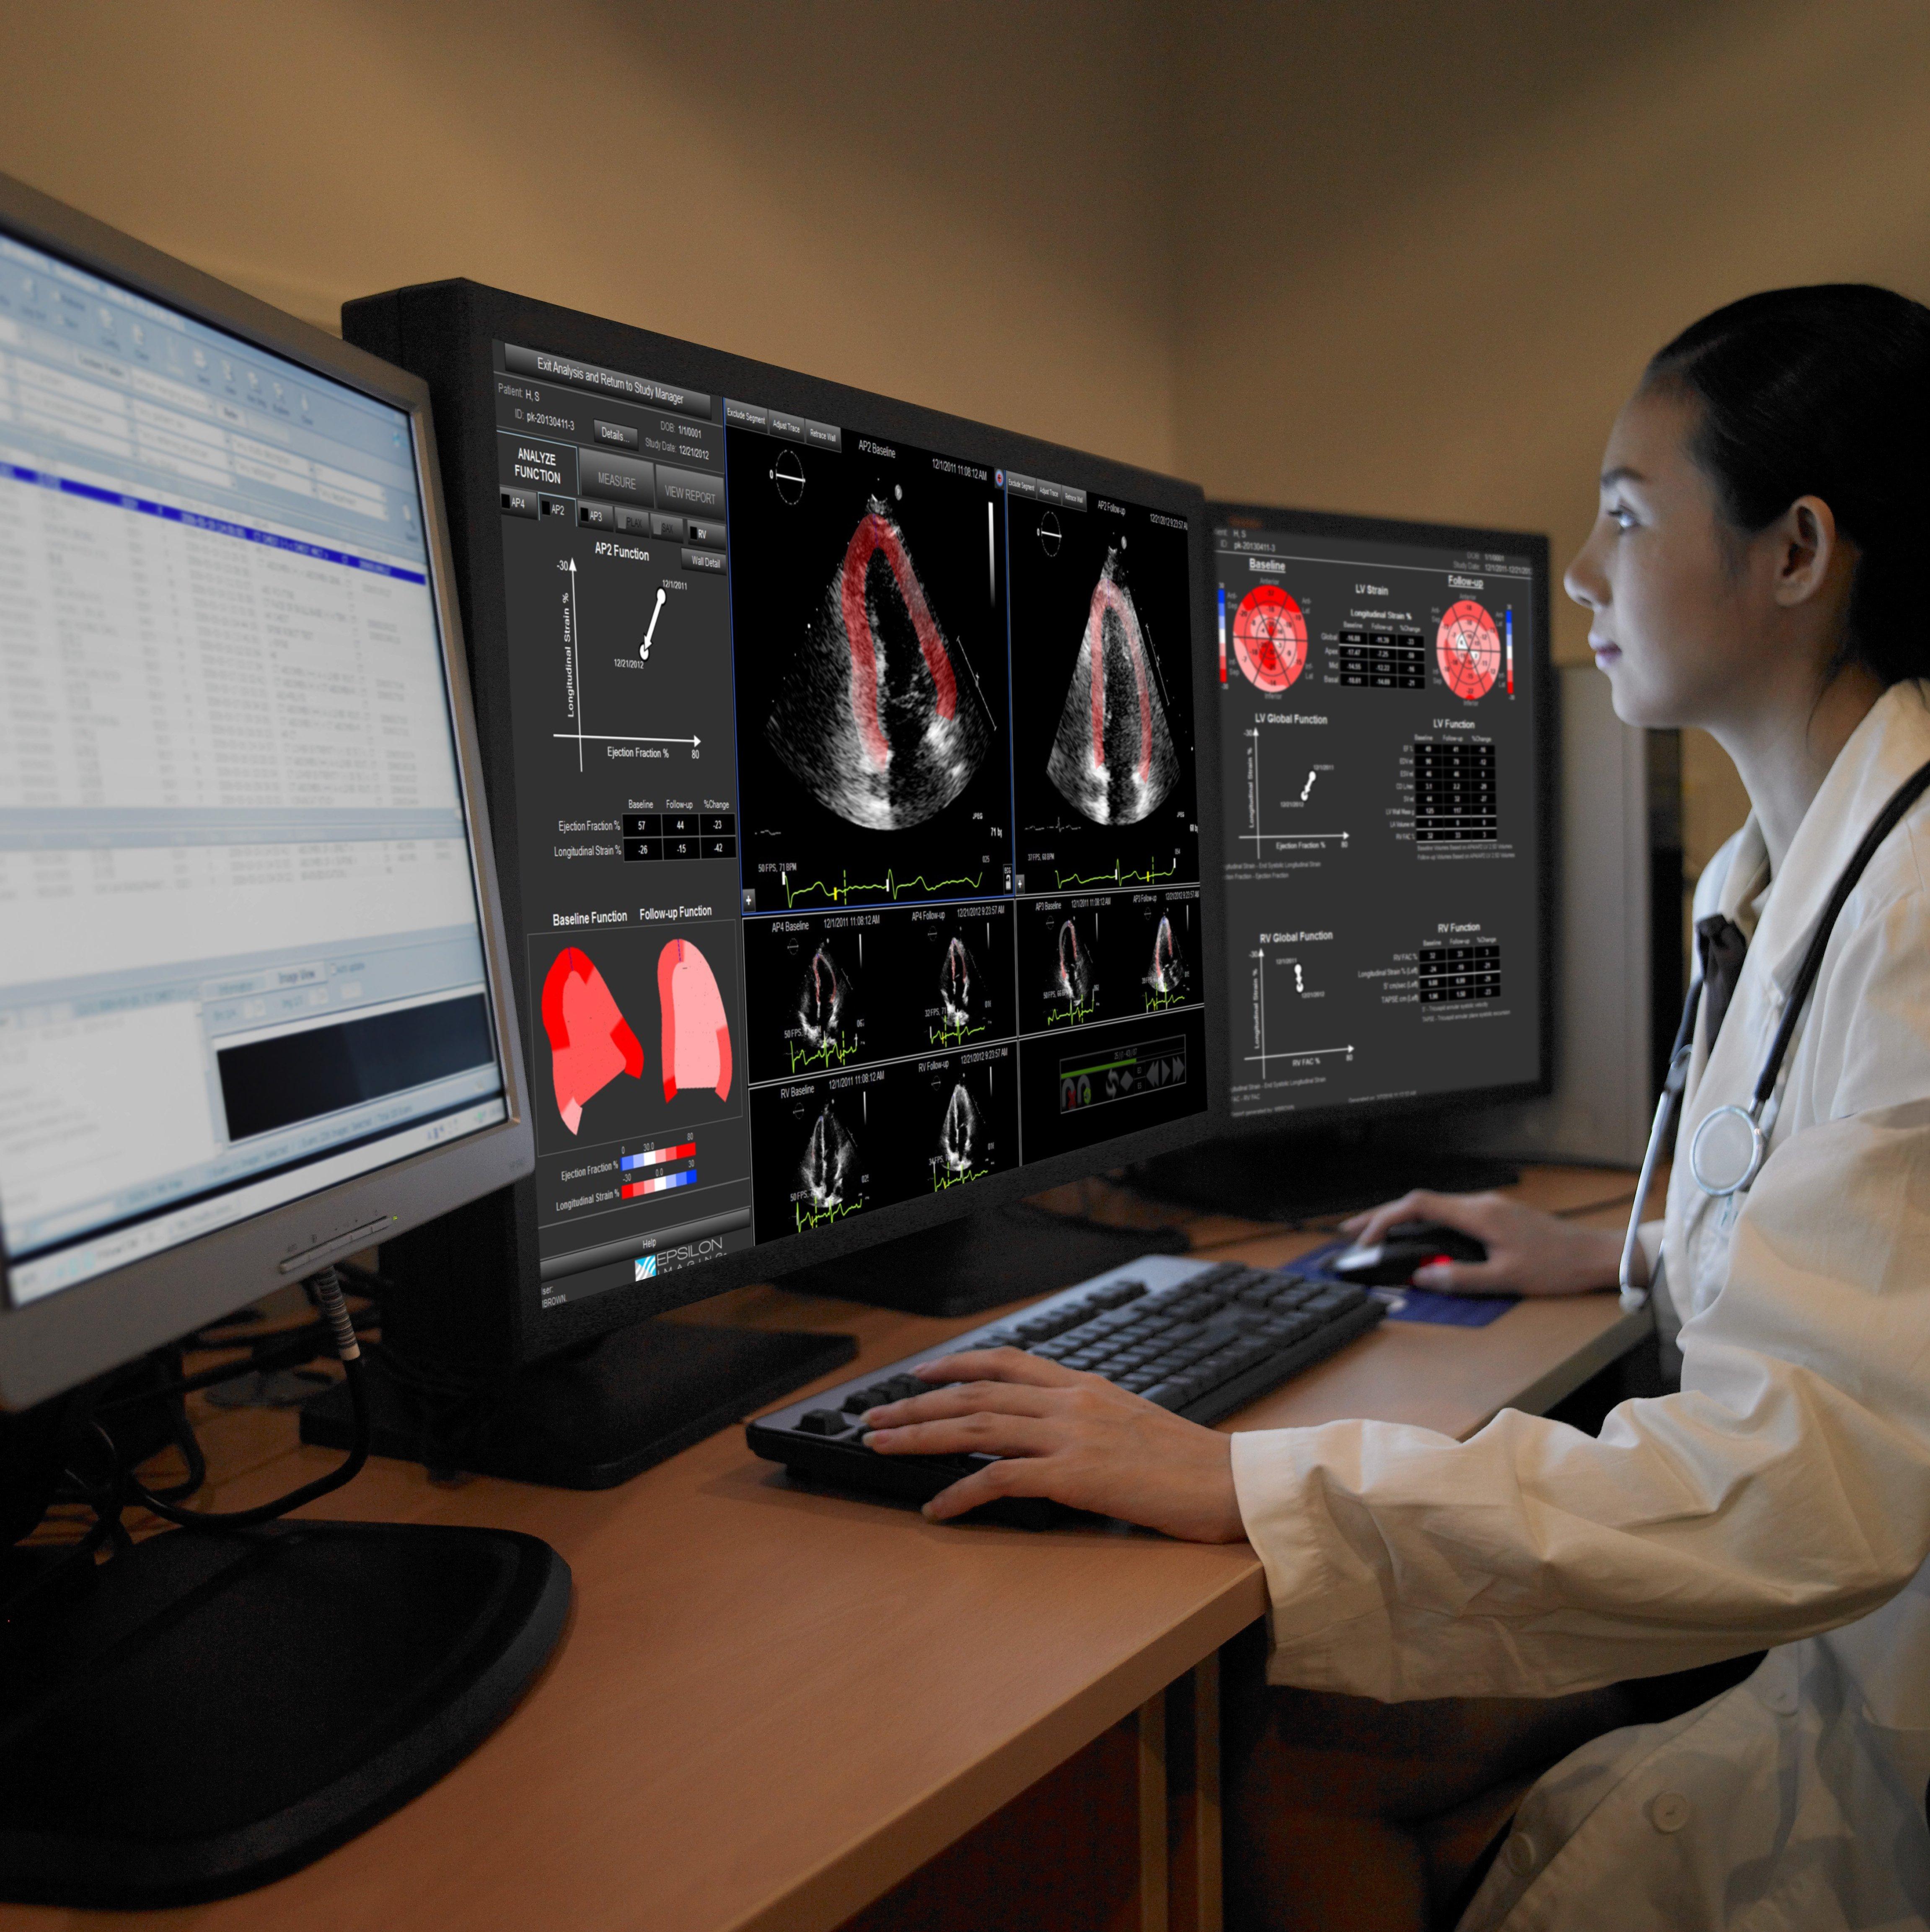 cardio-oncology, echo strain assessment, echoinsight, epsilon